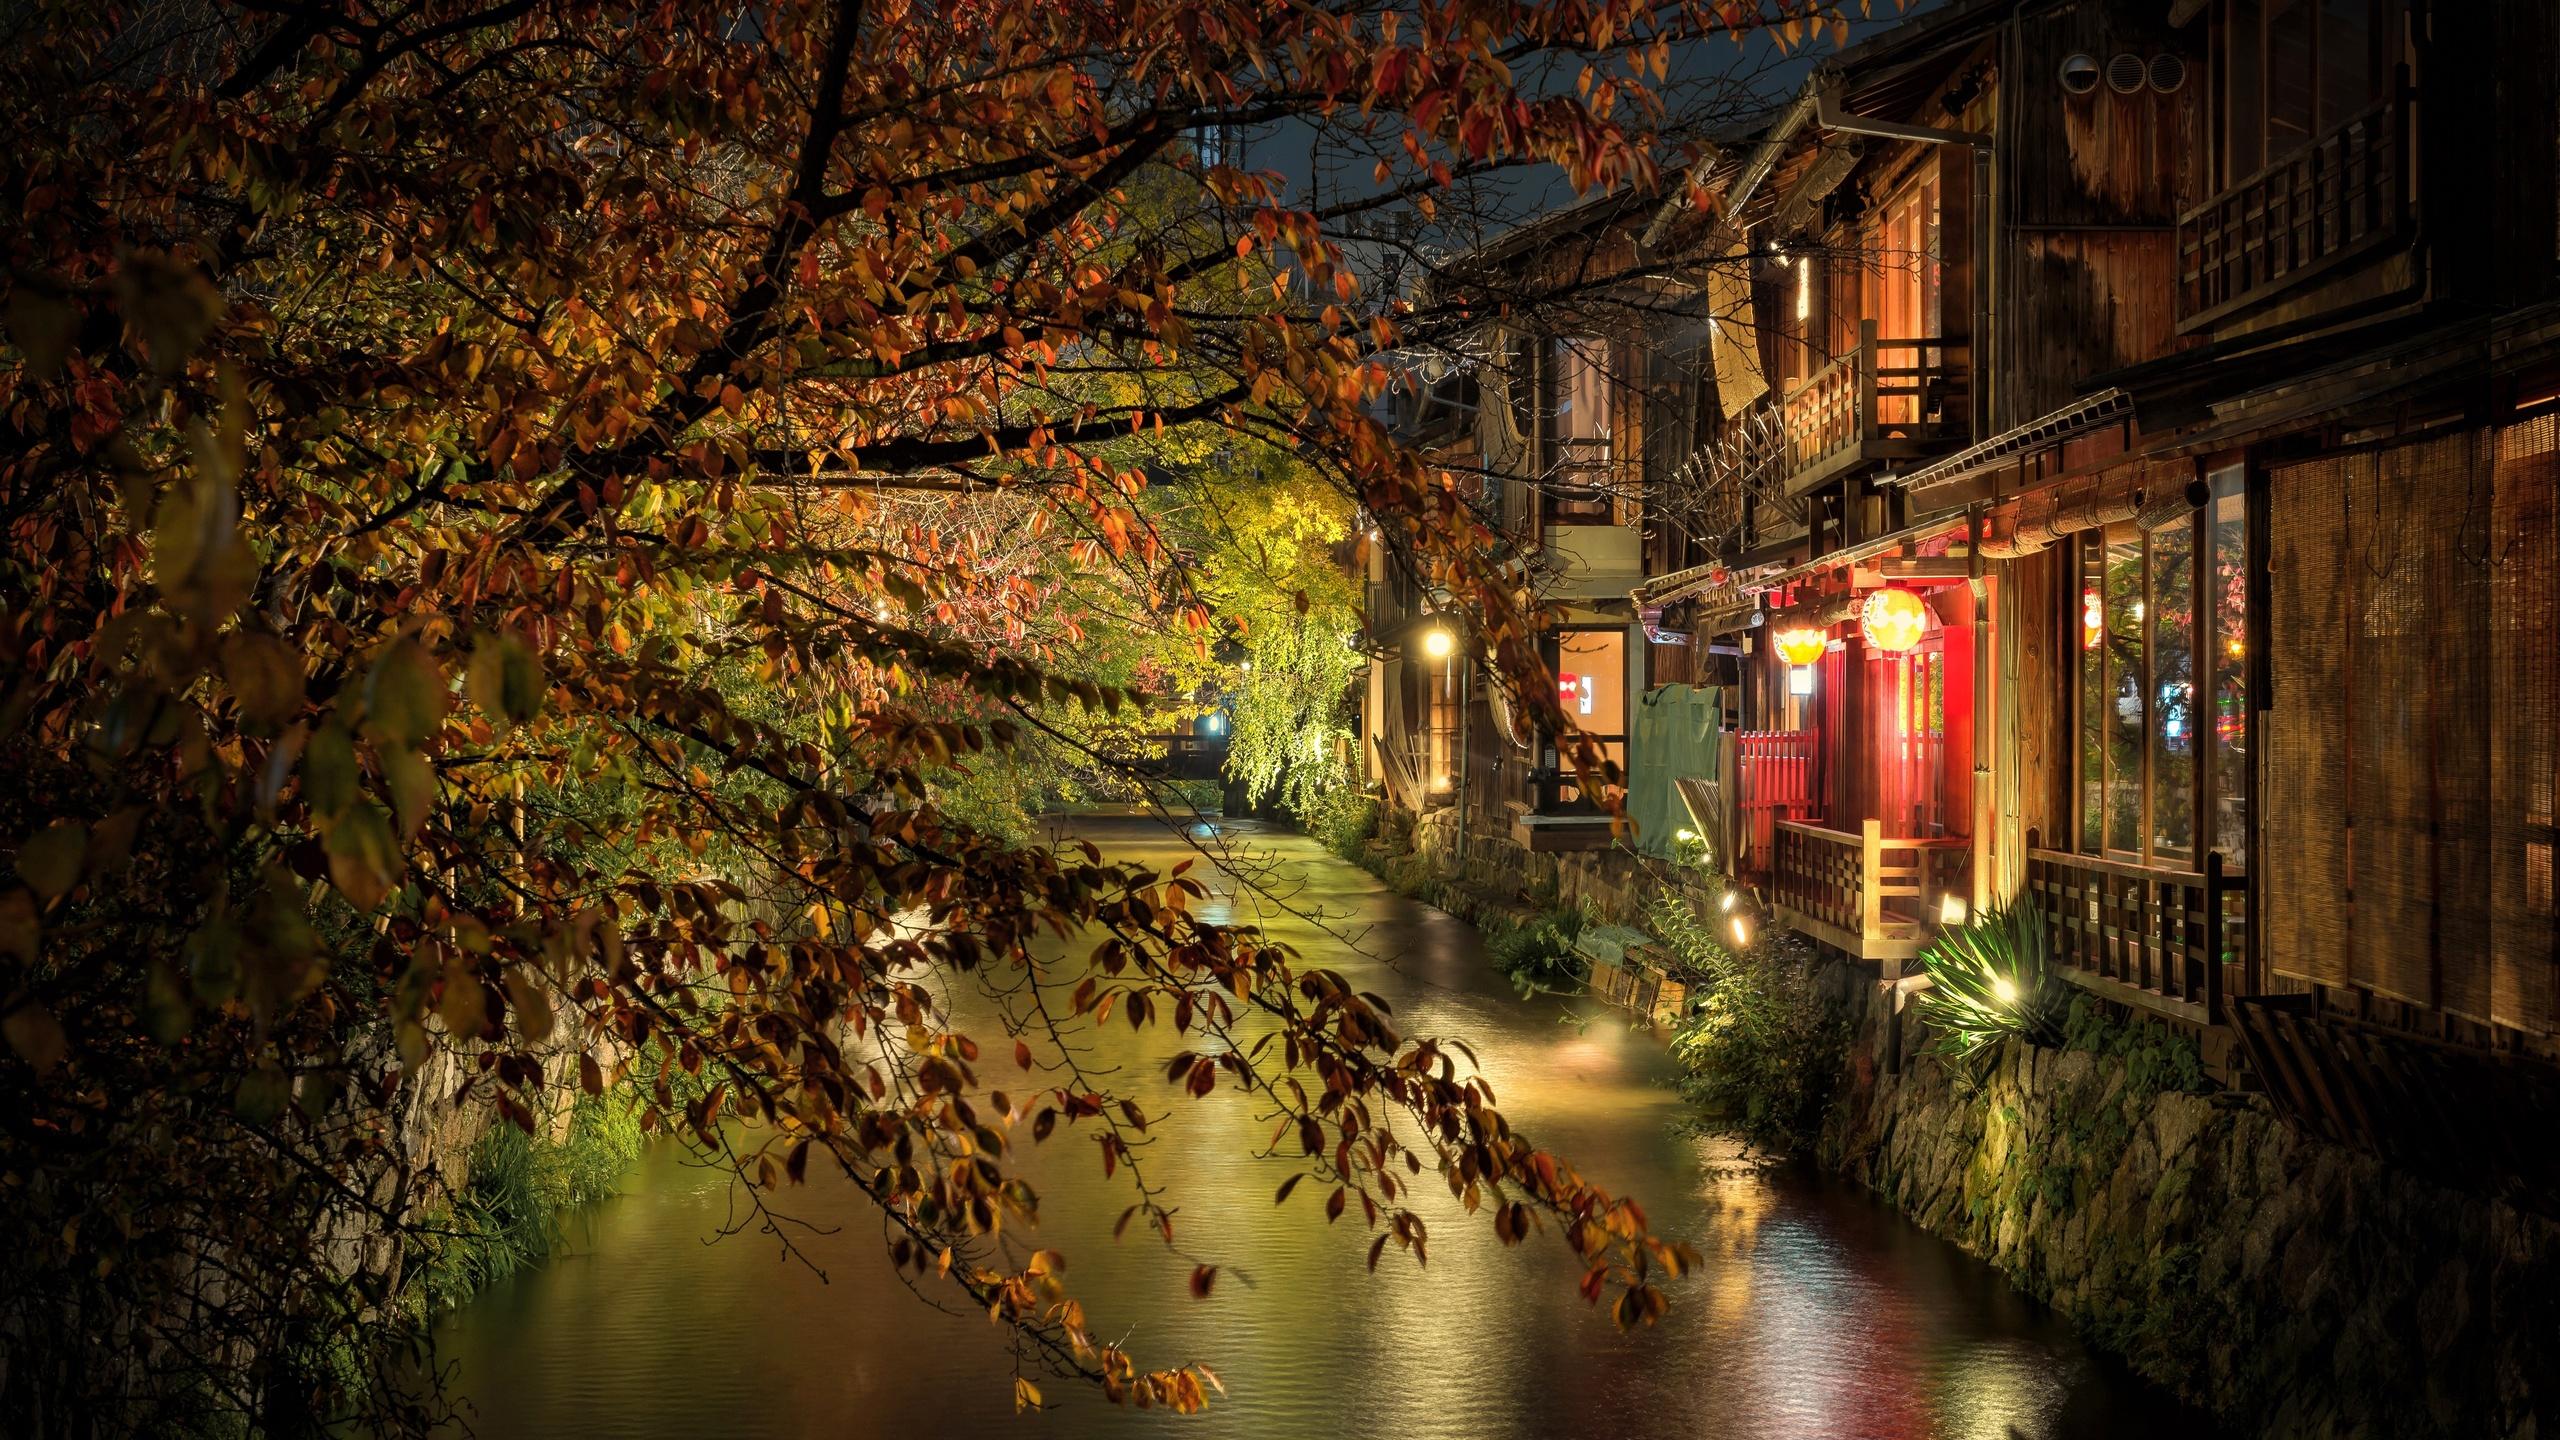 kyoto, evening, night, kyoto streets, japanese city, lights, japan